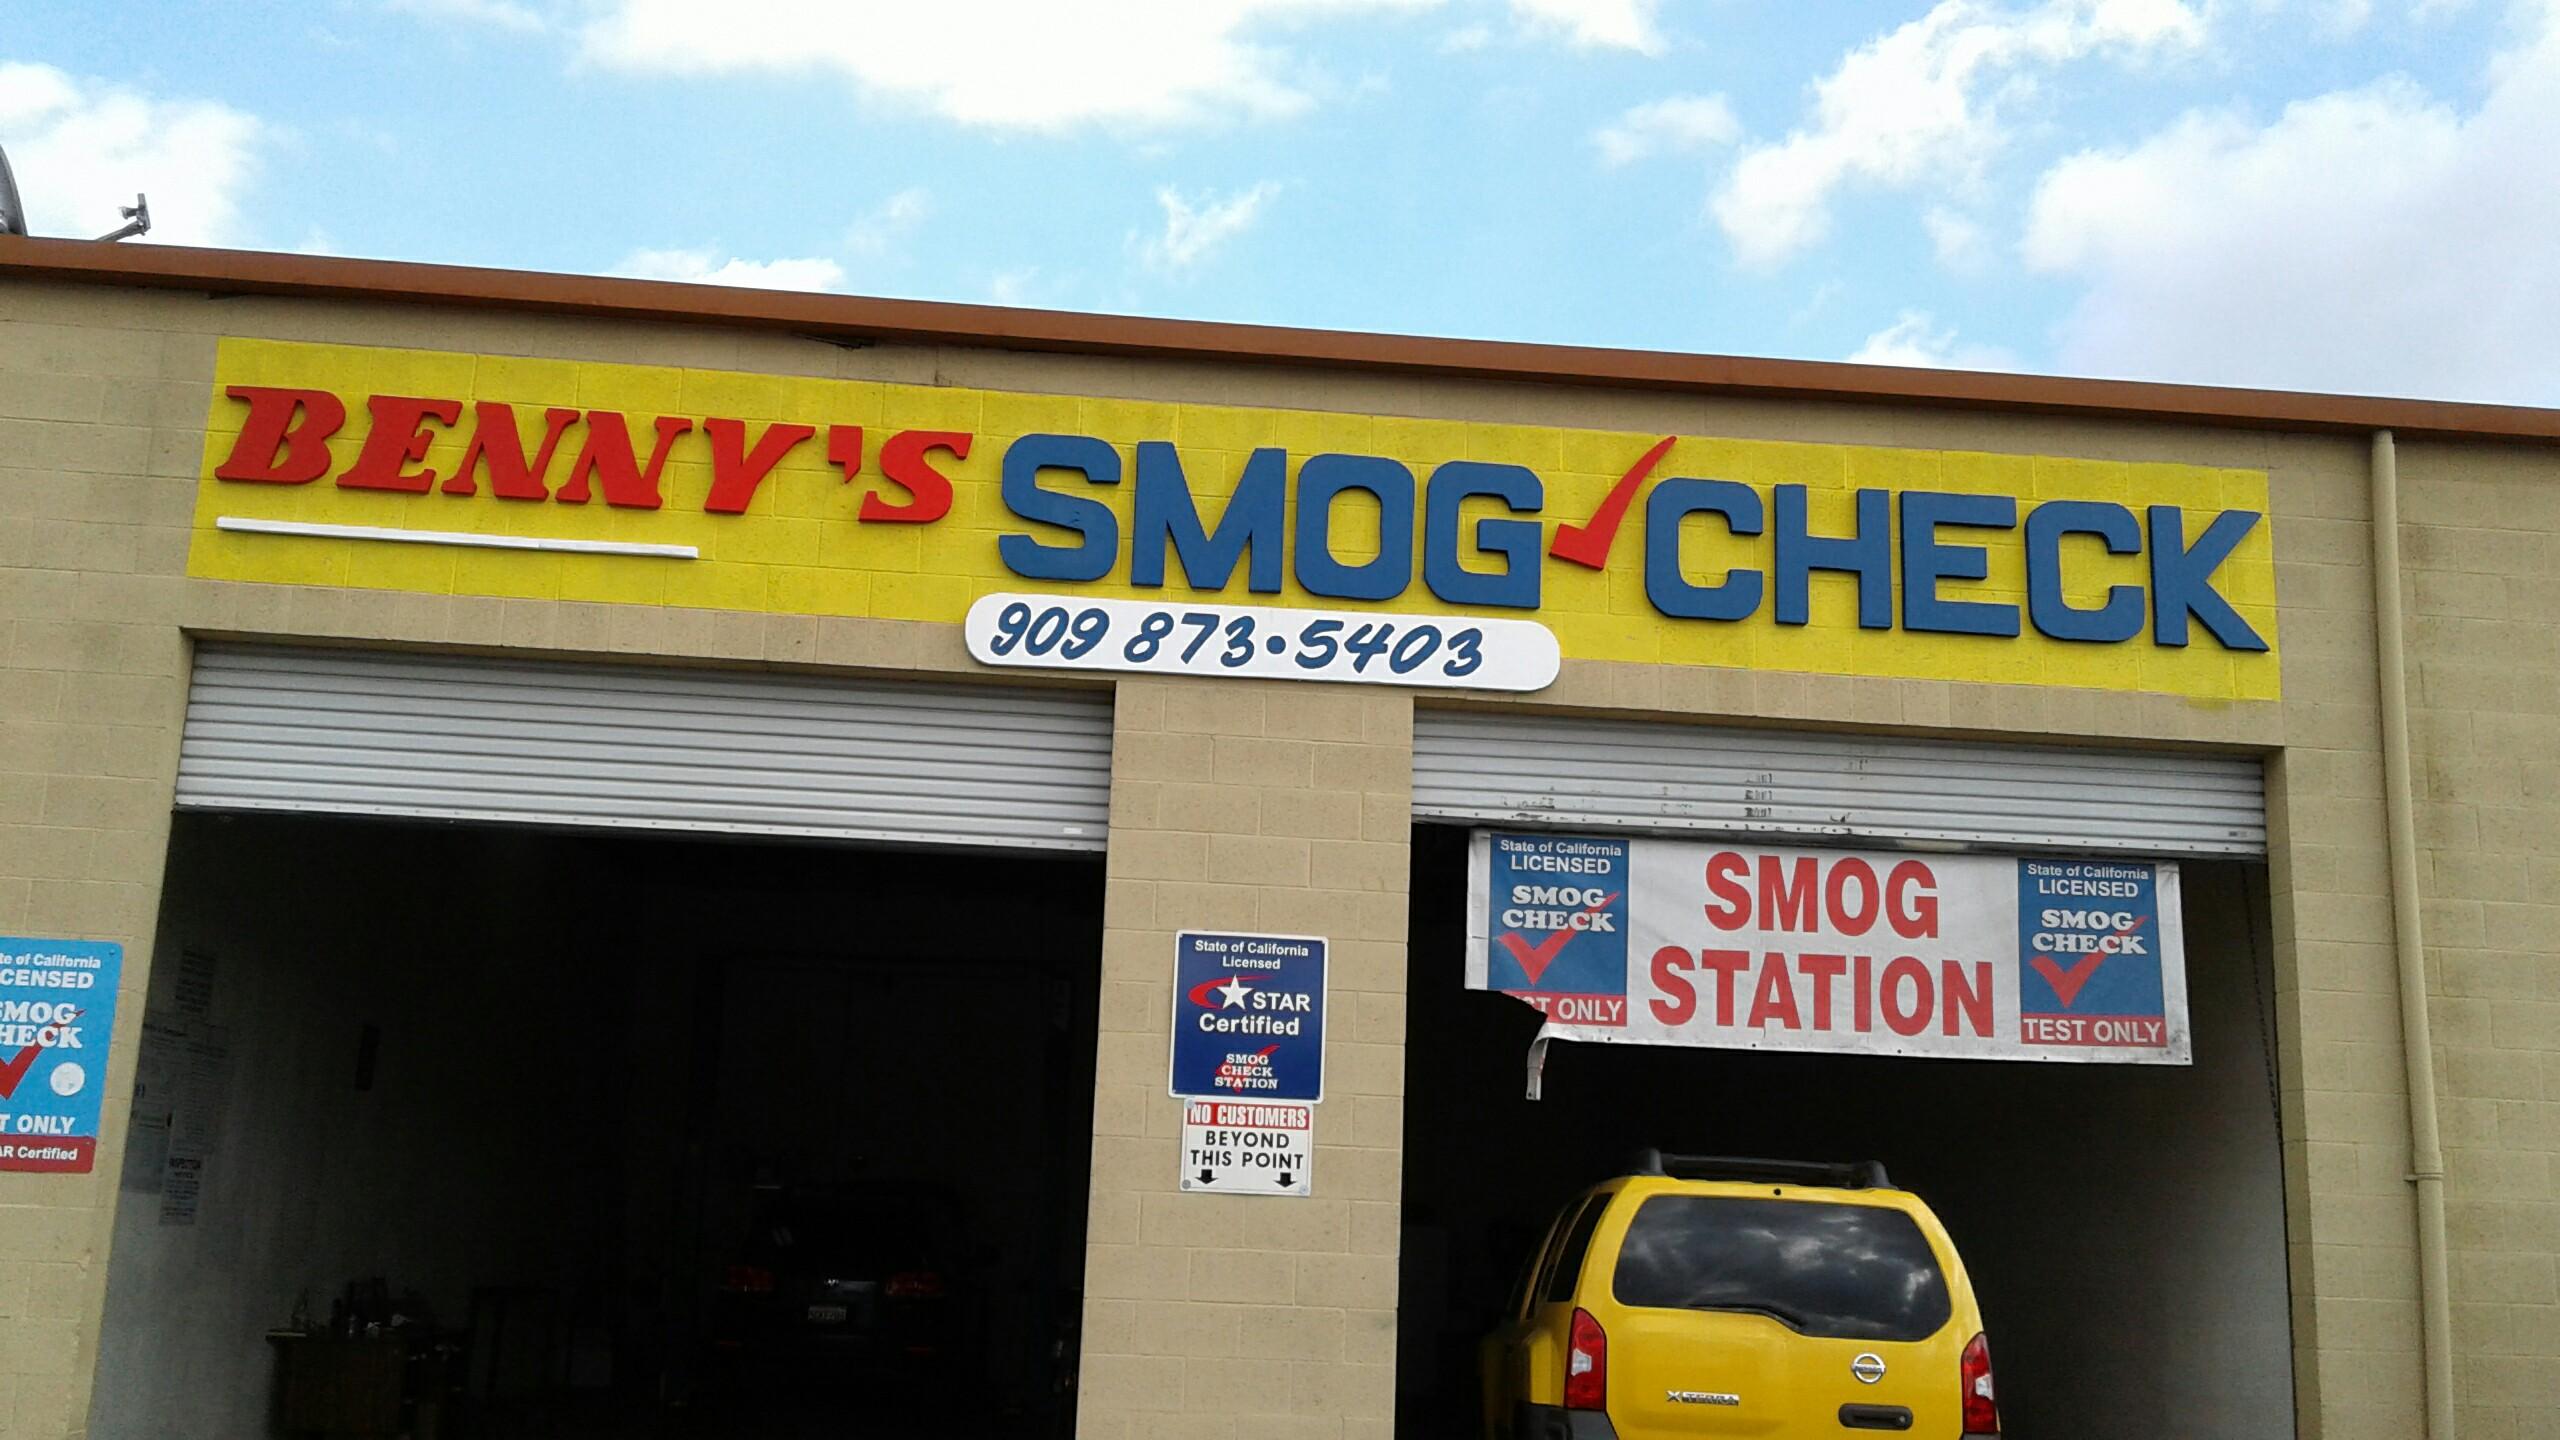 Smog Check Las Vegas >> Smog Check Las Vegas   News of New Car Release